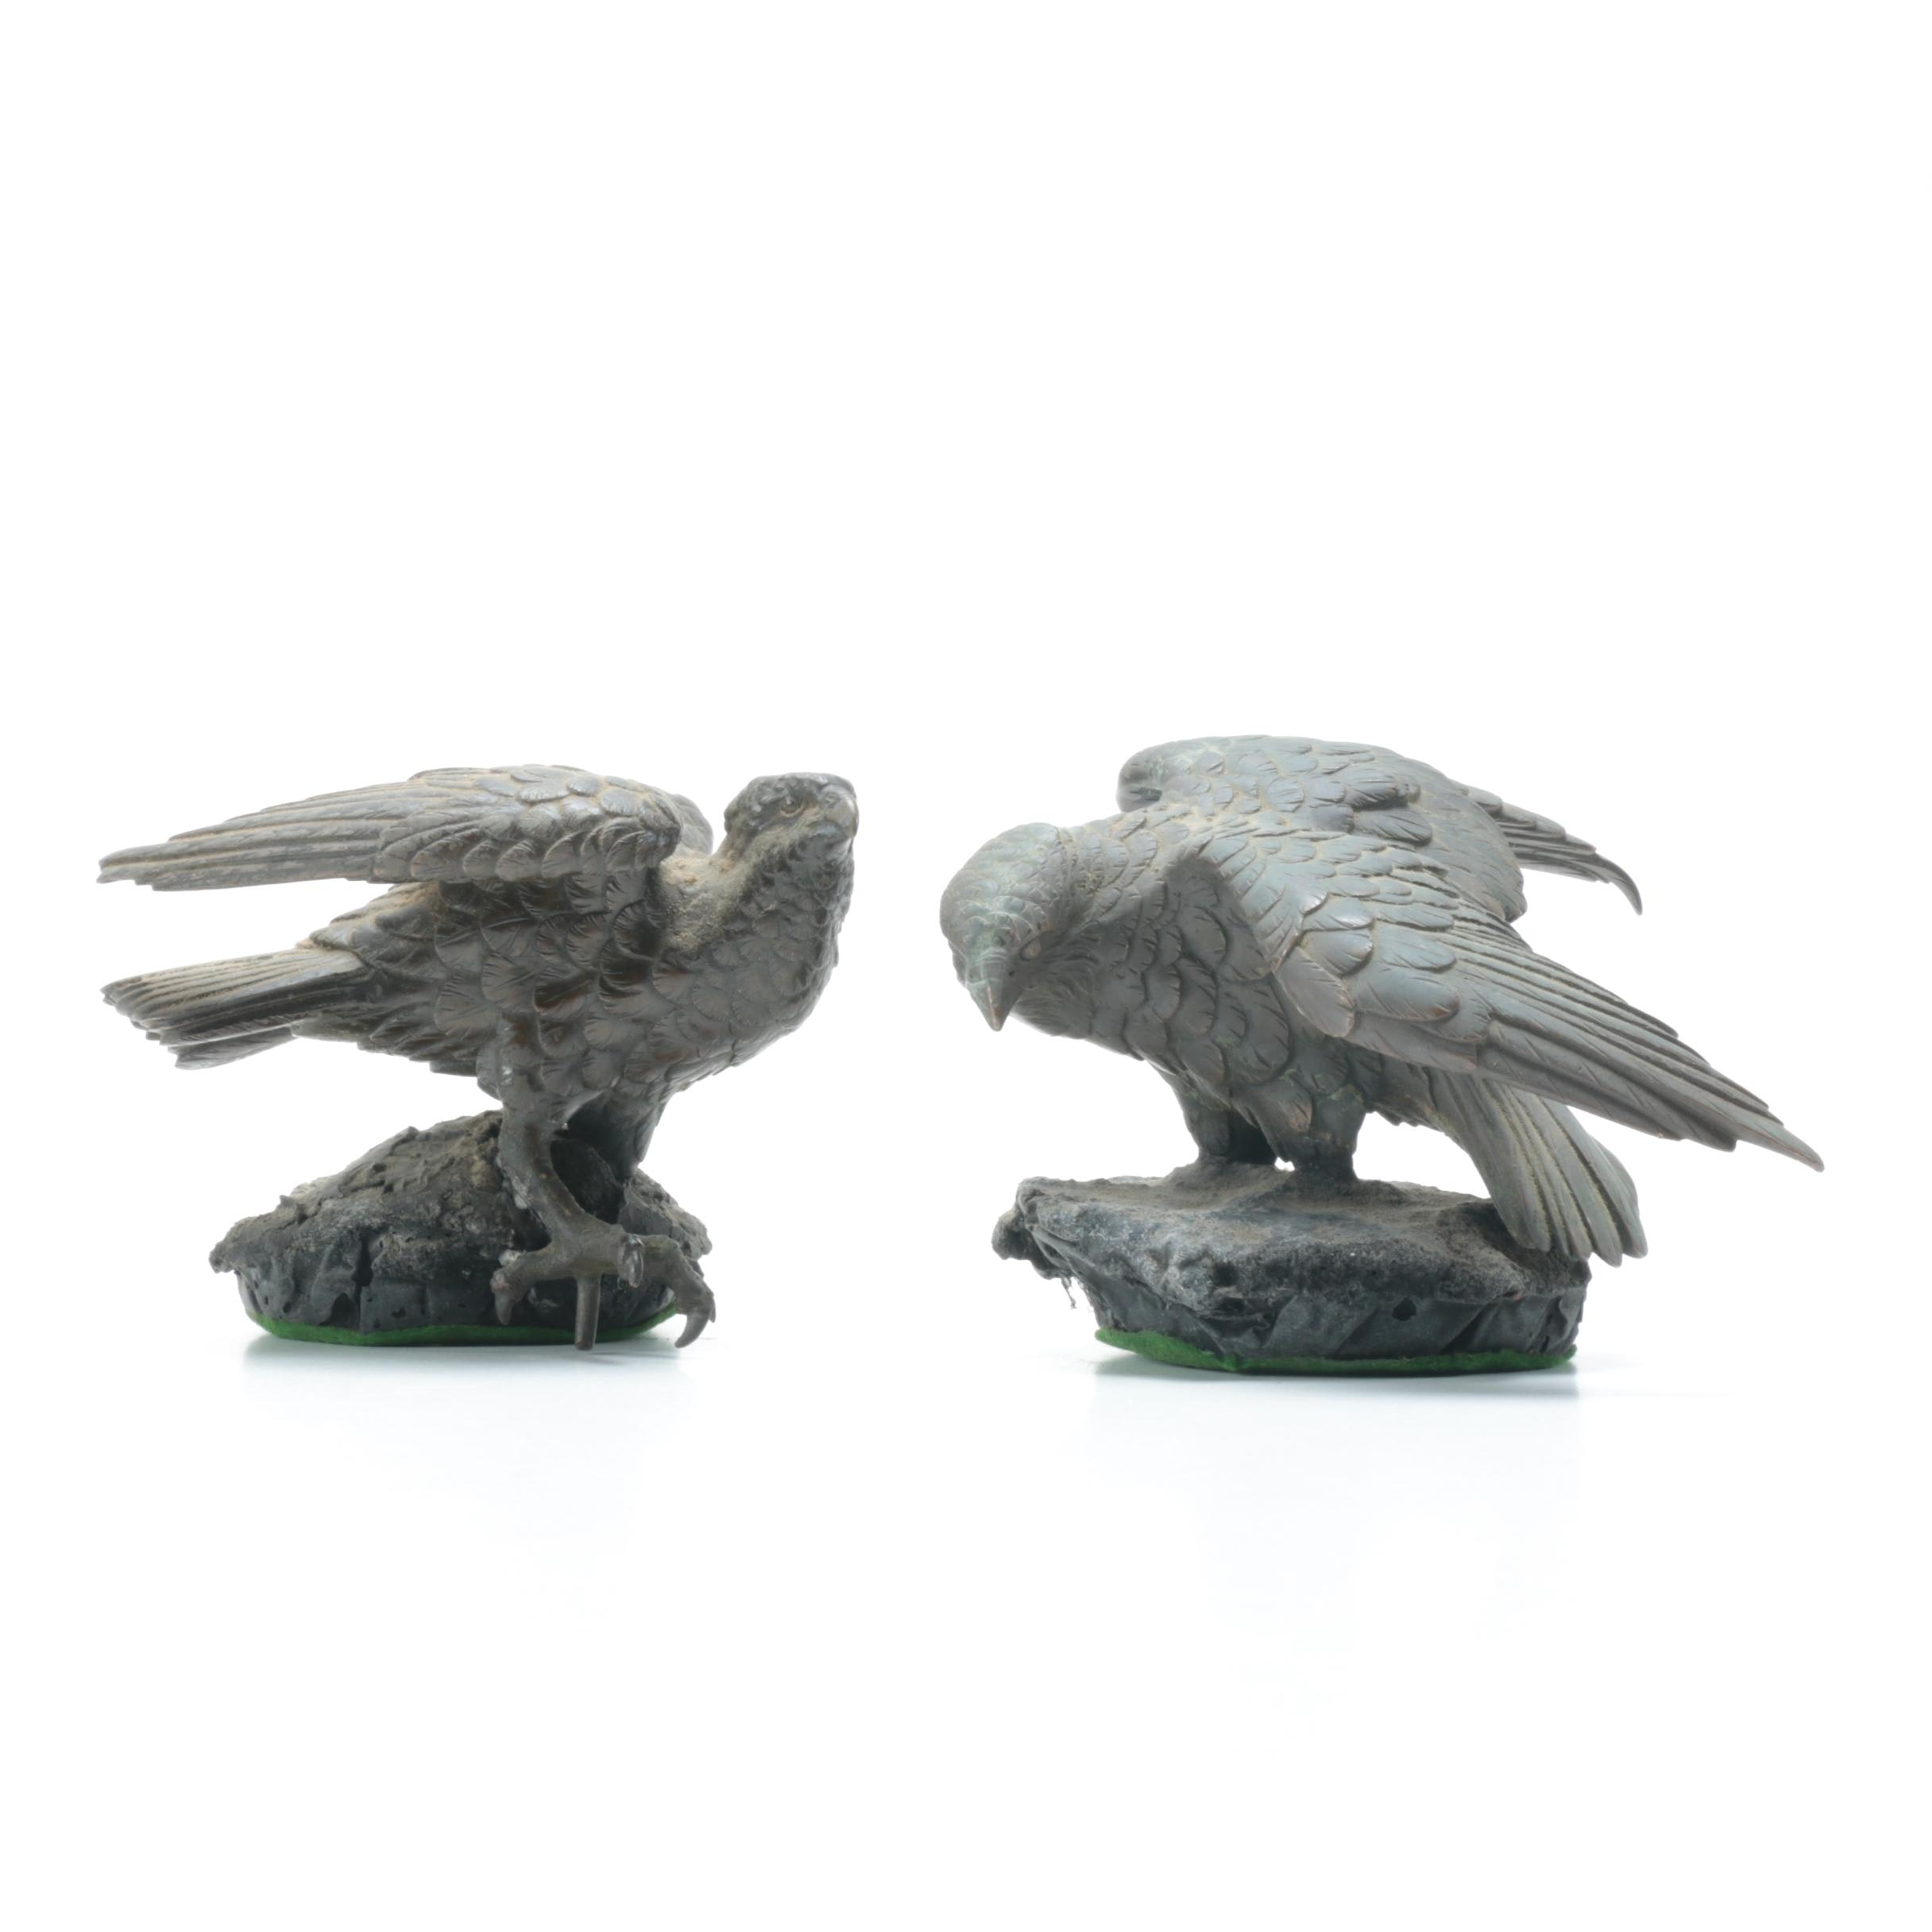 Metal Covered Birds of Prey Figurines